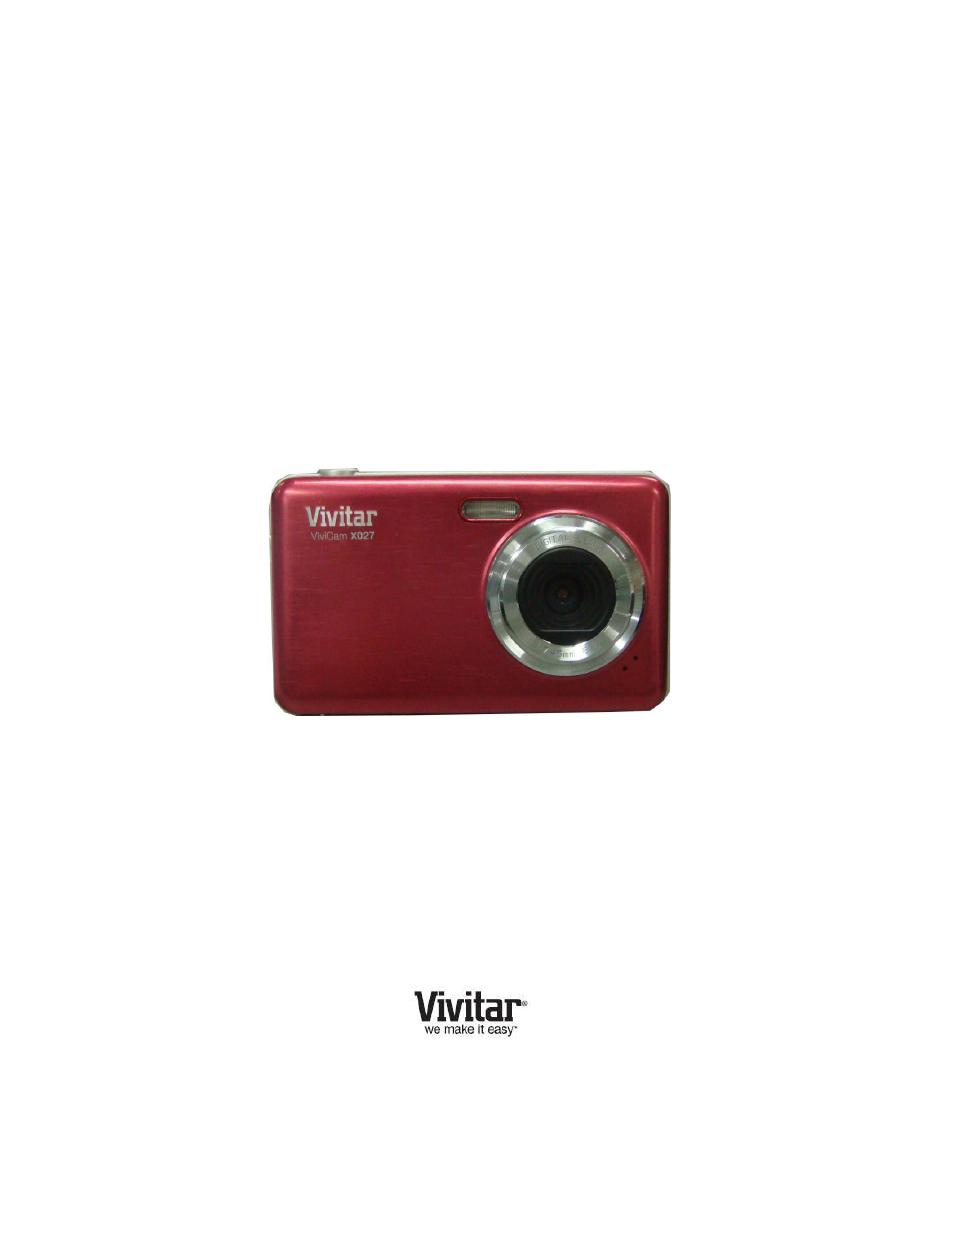 vivitar vivicam x027 user manual 63 pages rh manualsdir com  vivicam x029 manual